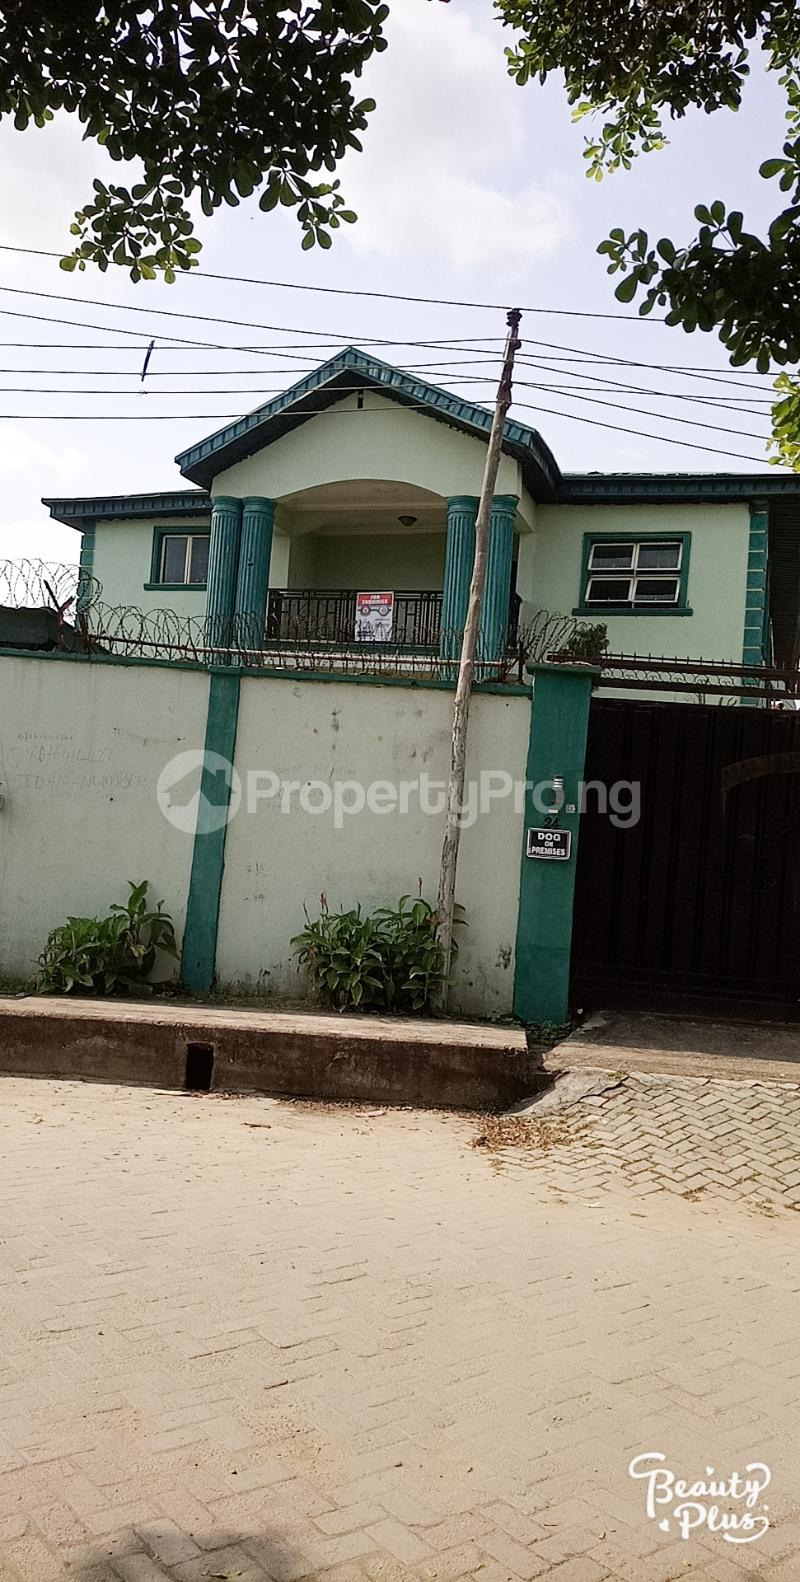 5 bedroom Detached Duplex House for sale Ajao Estate Isolo. Lagos Mainland Ajao Estate Isolo Lagos - 5